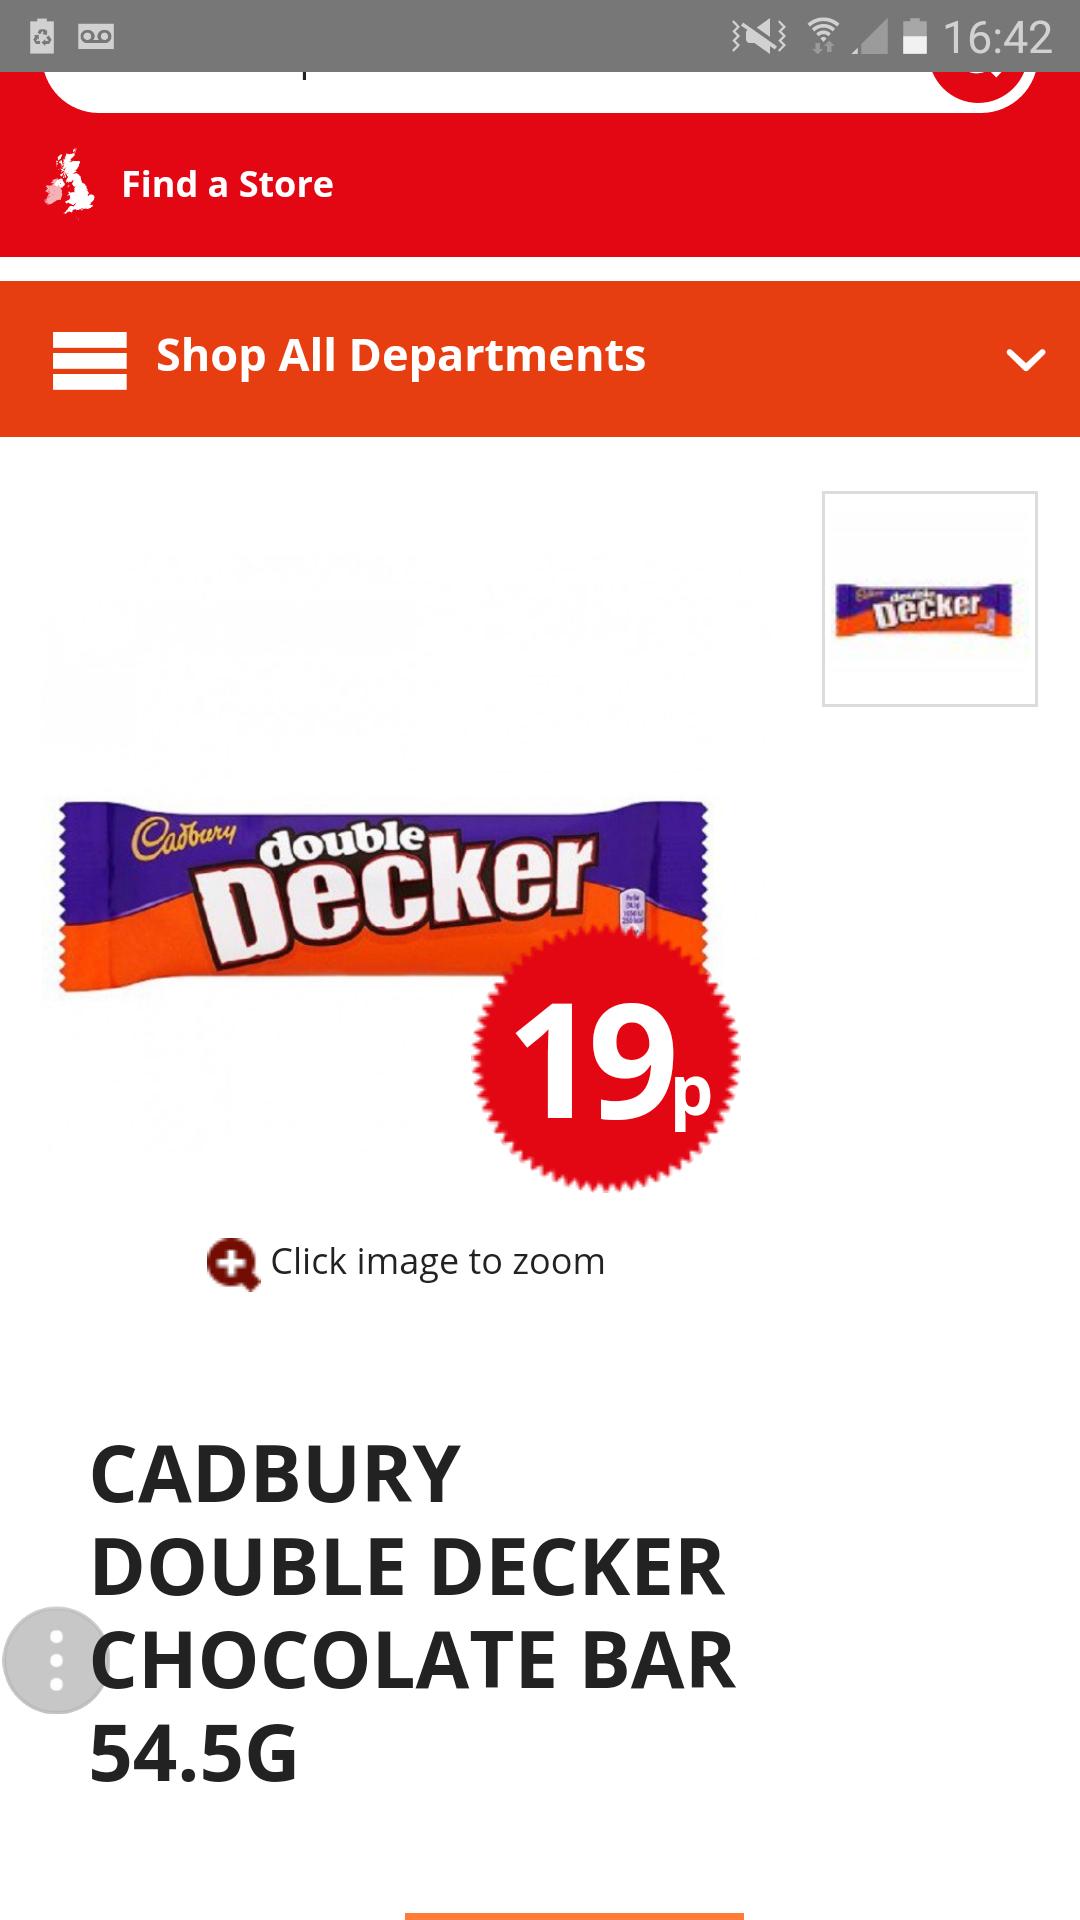 Cadbury double decker 54.5g bar just 19p rrp 65p @ poundstretcher